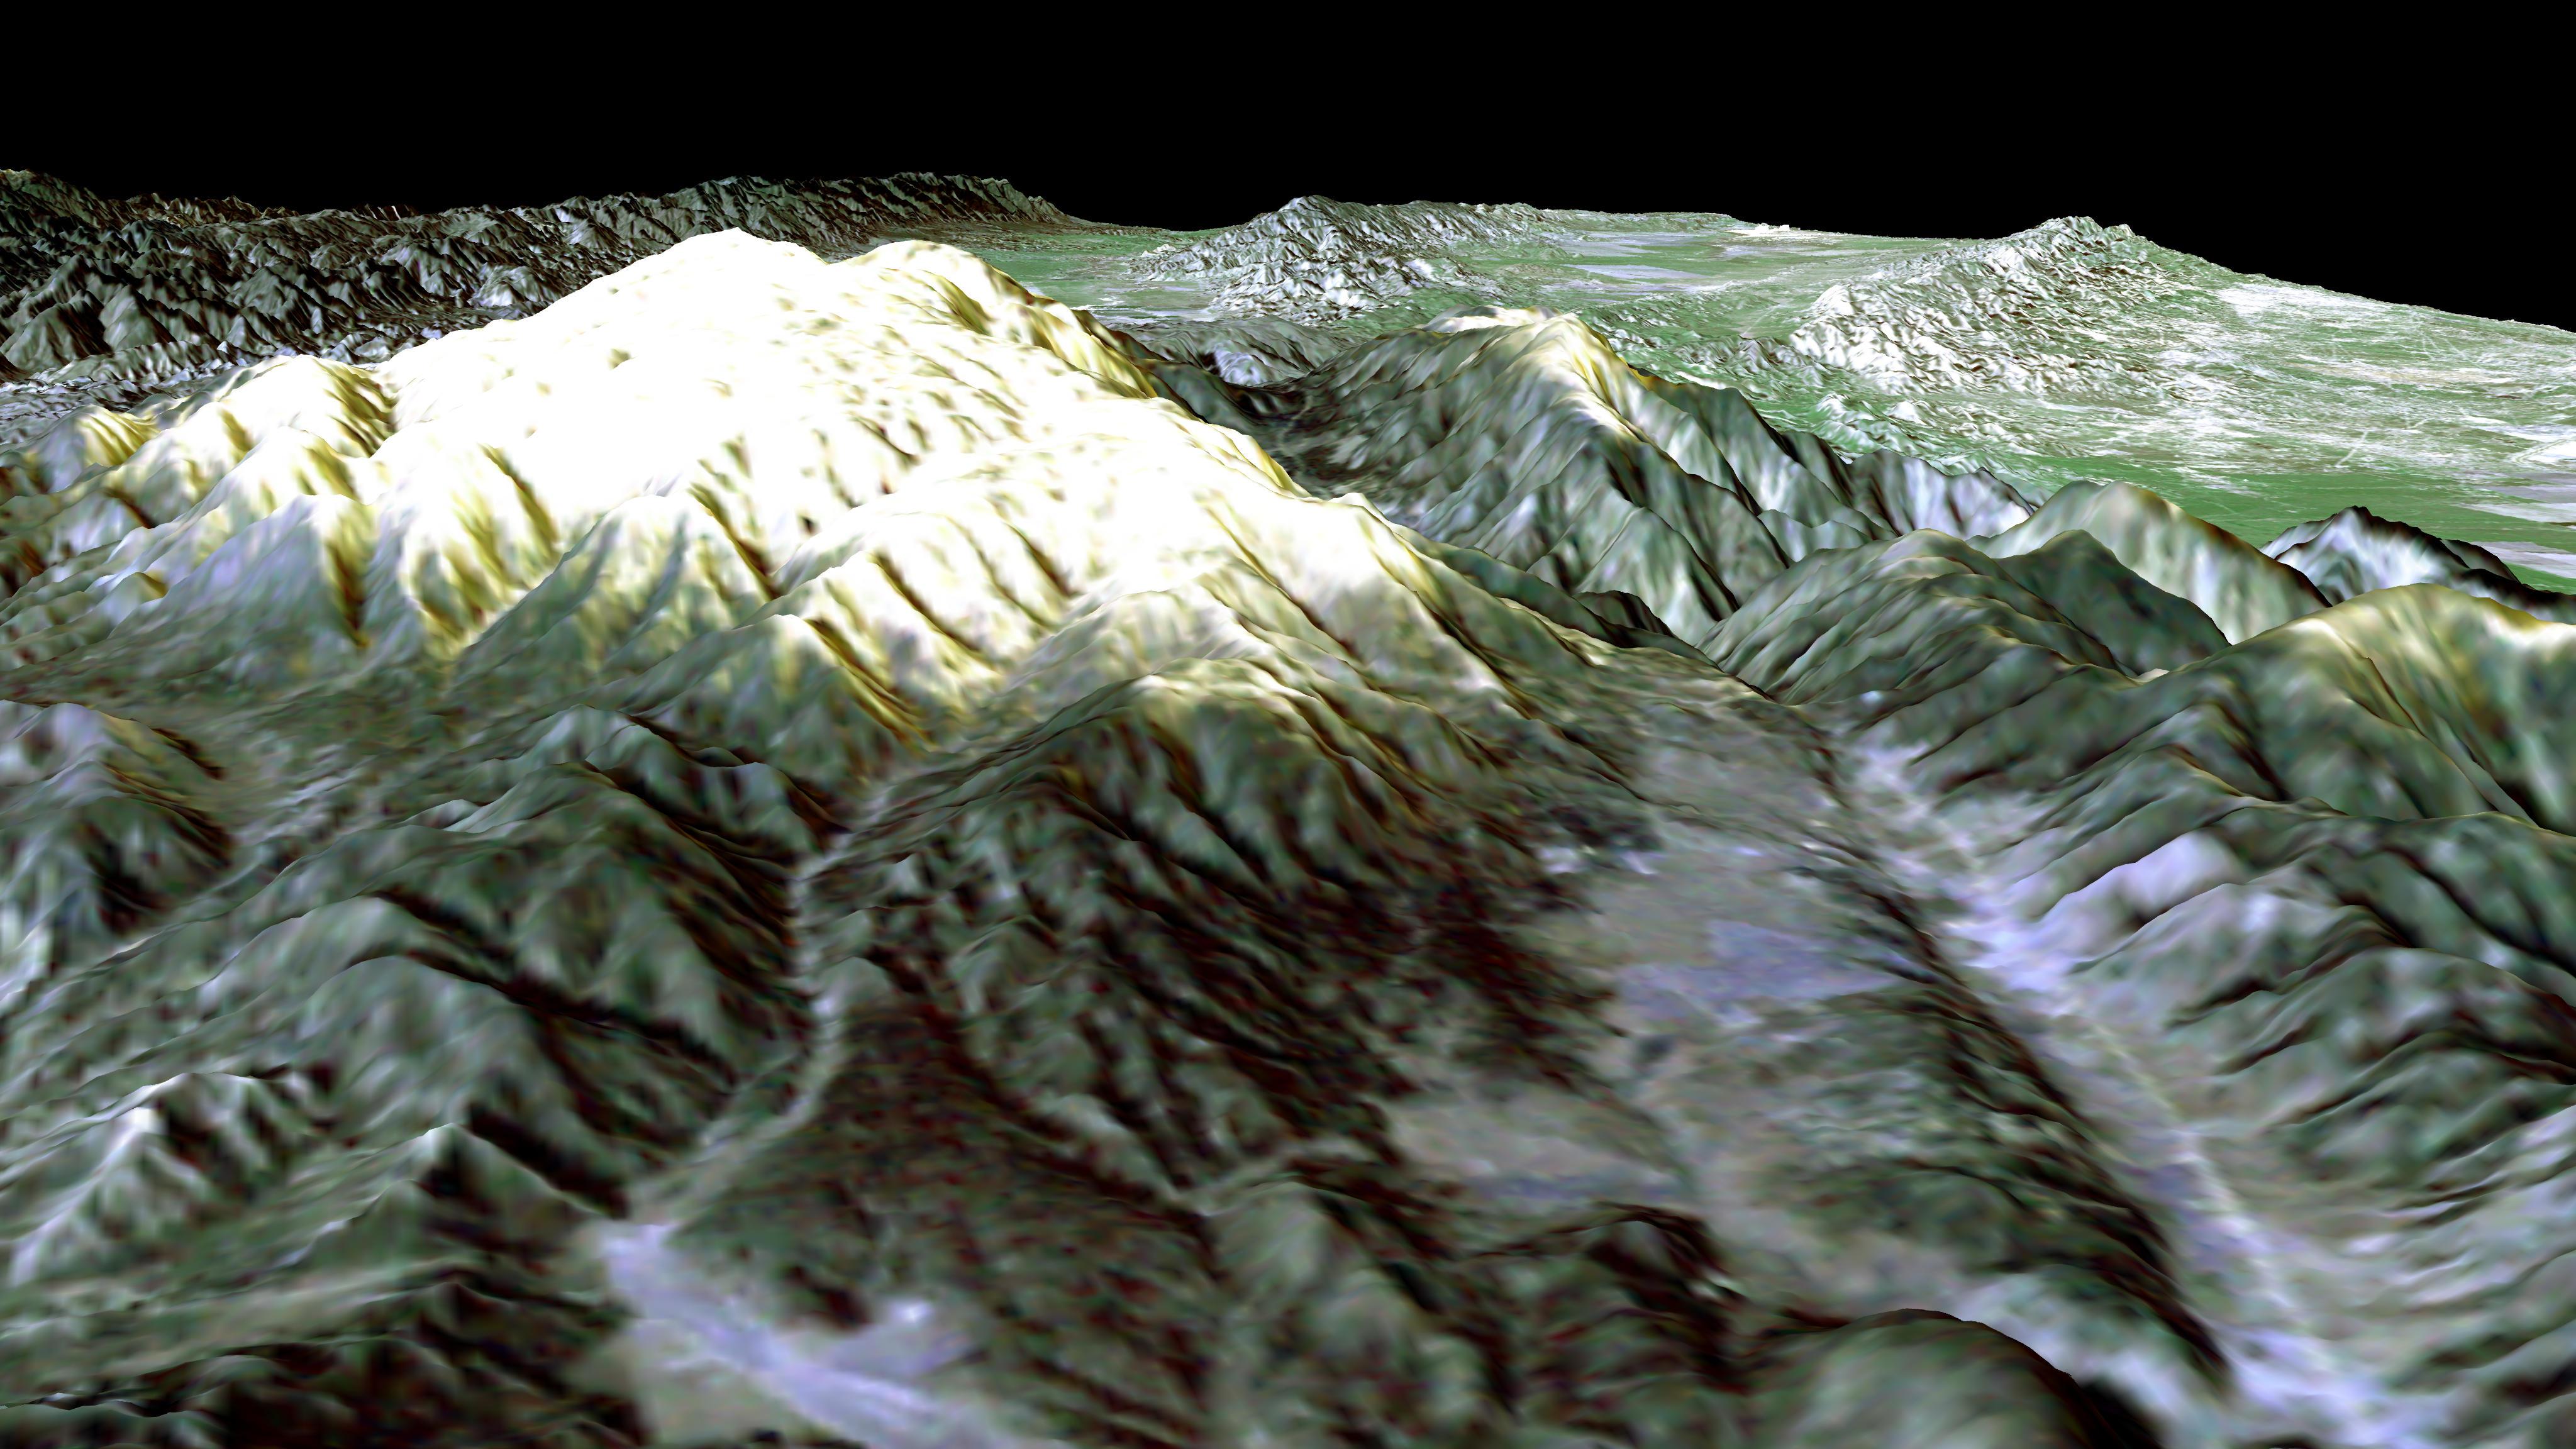 Mount Pinos, California